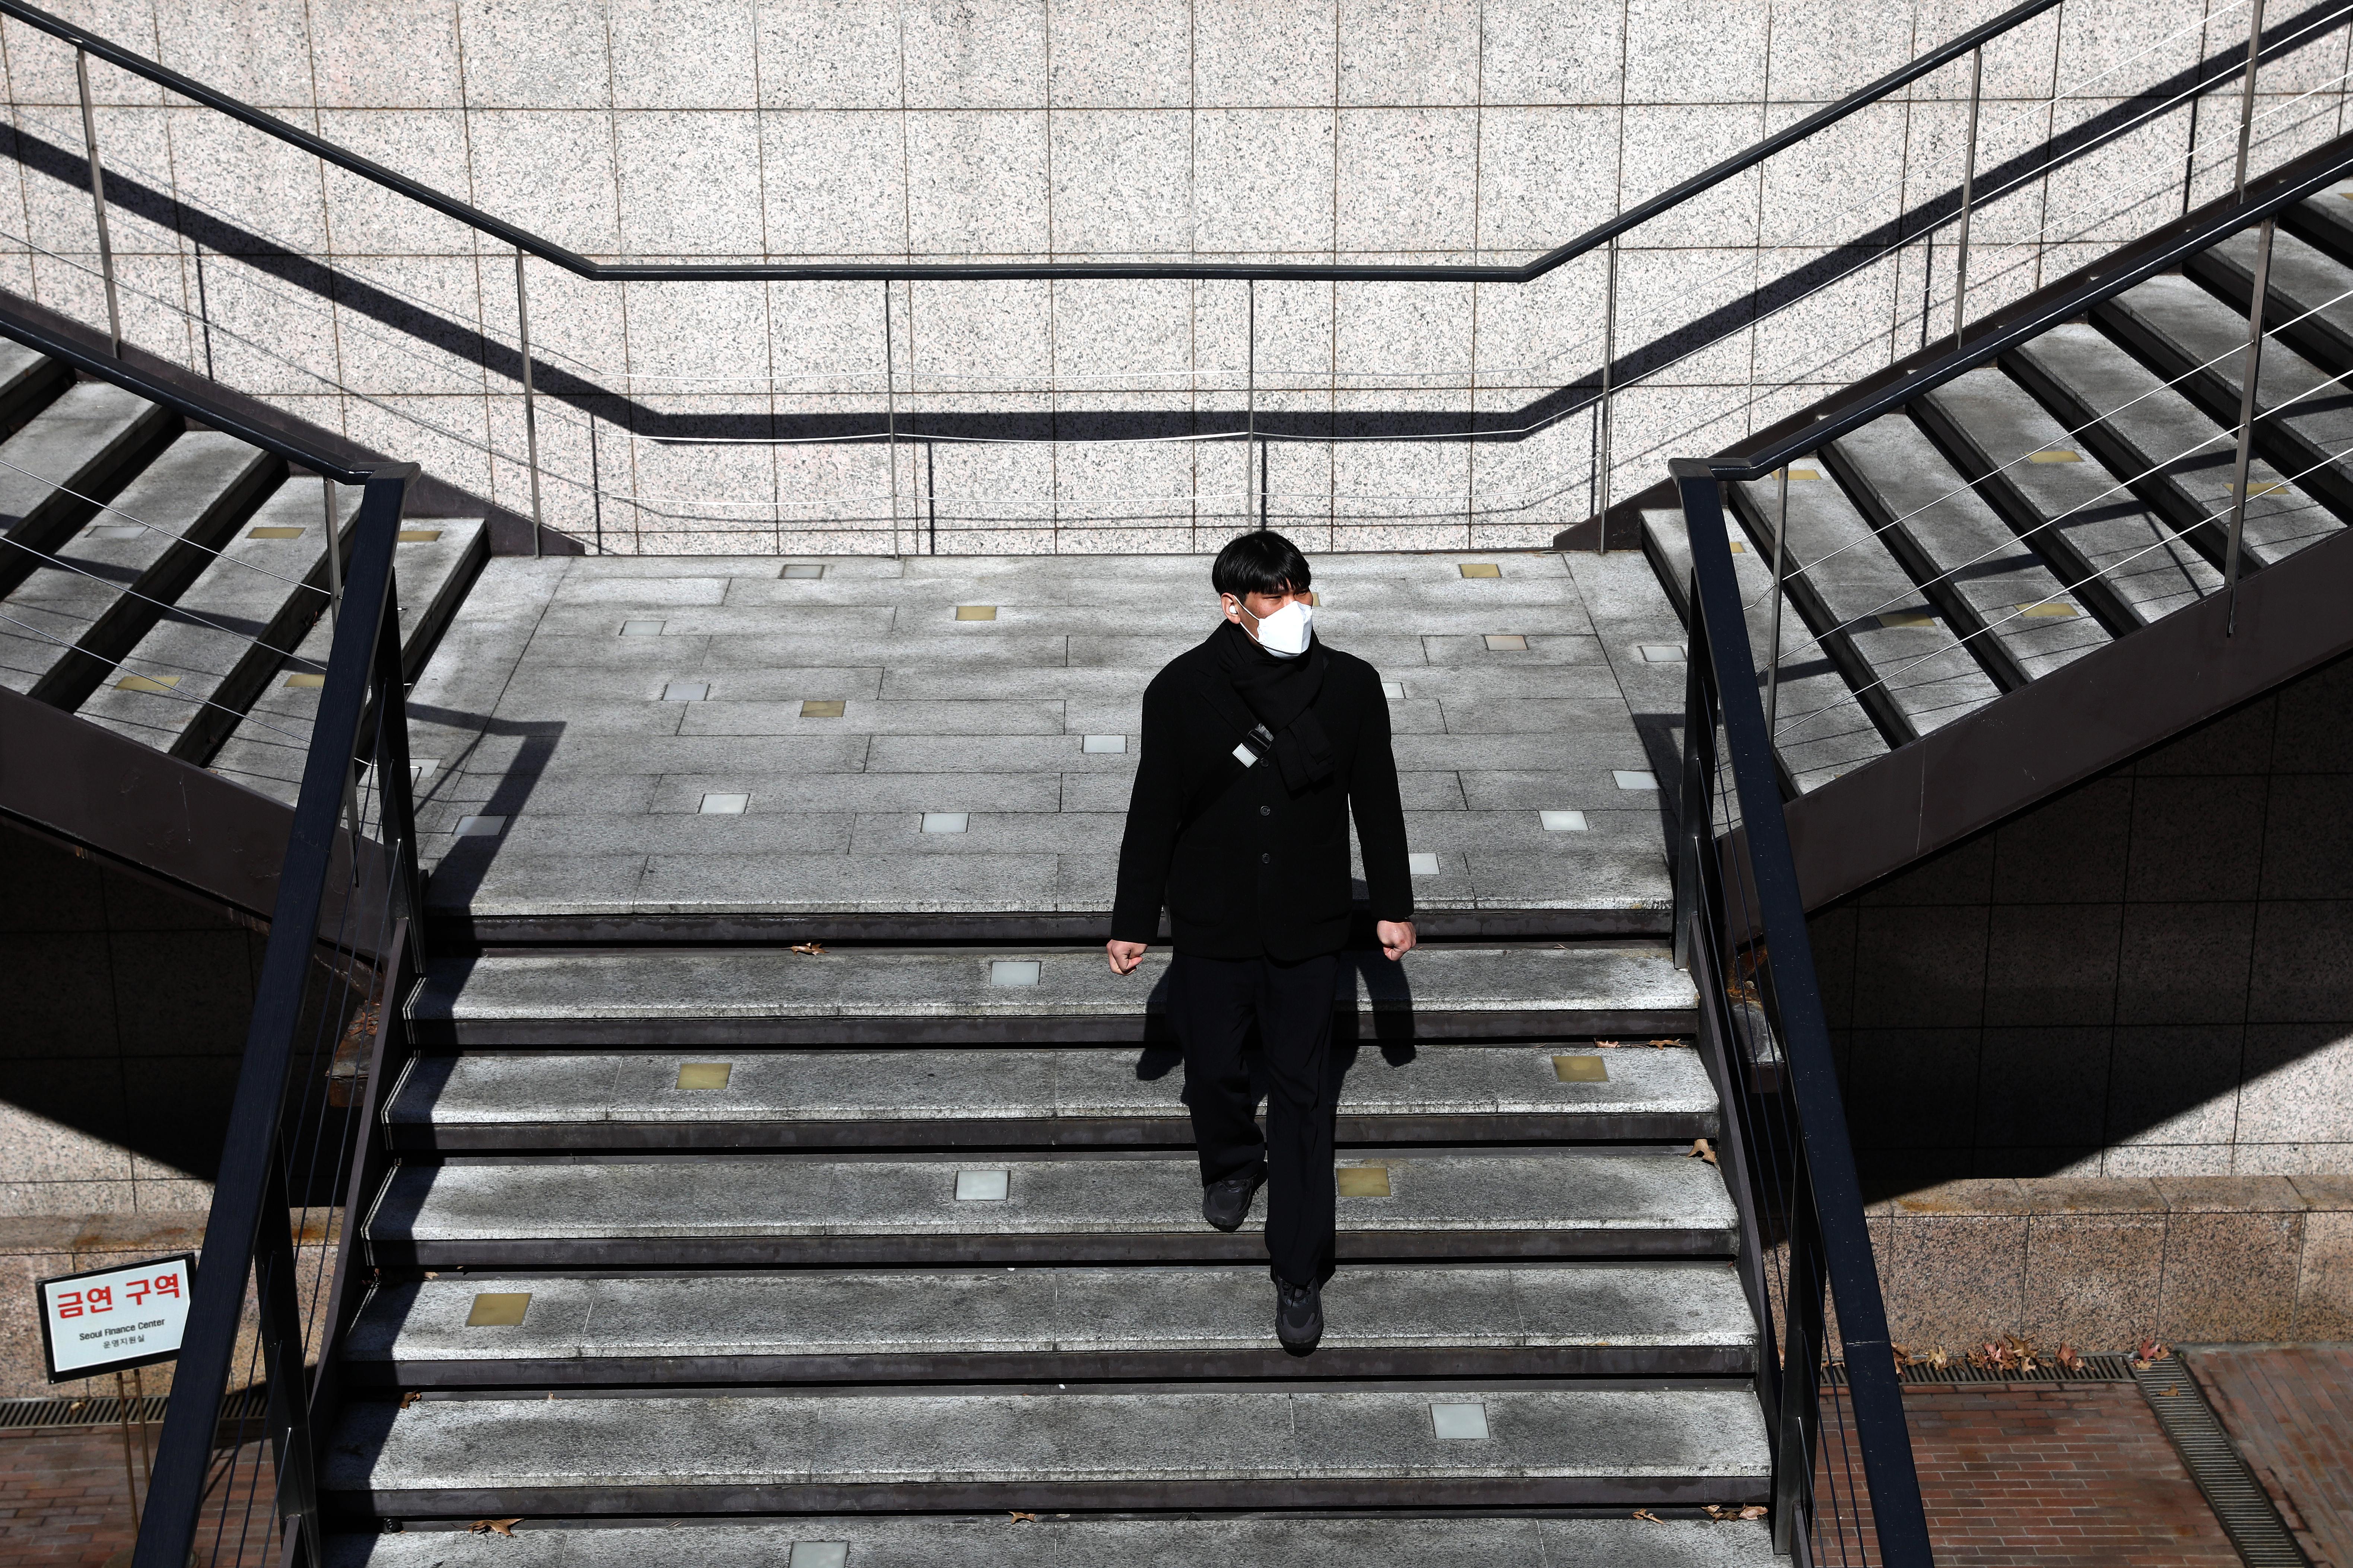 As Covid-19 cases rise, South Korea raises virus threat level to its maximum